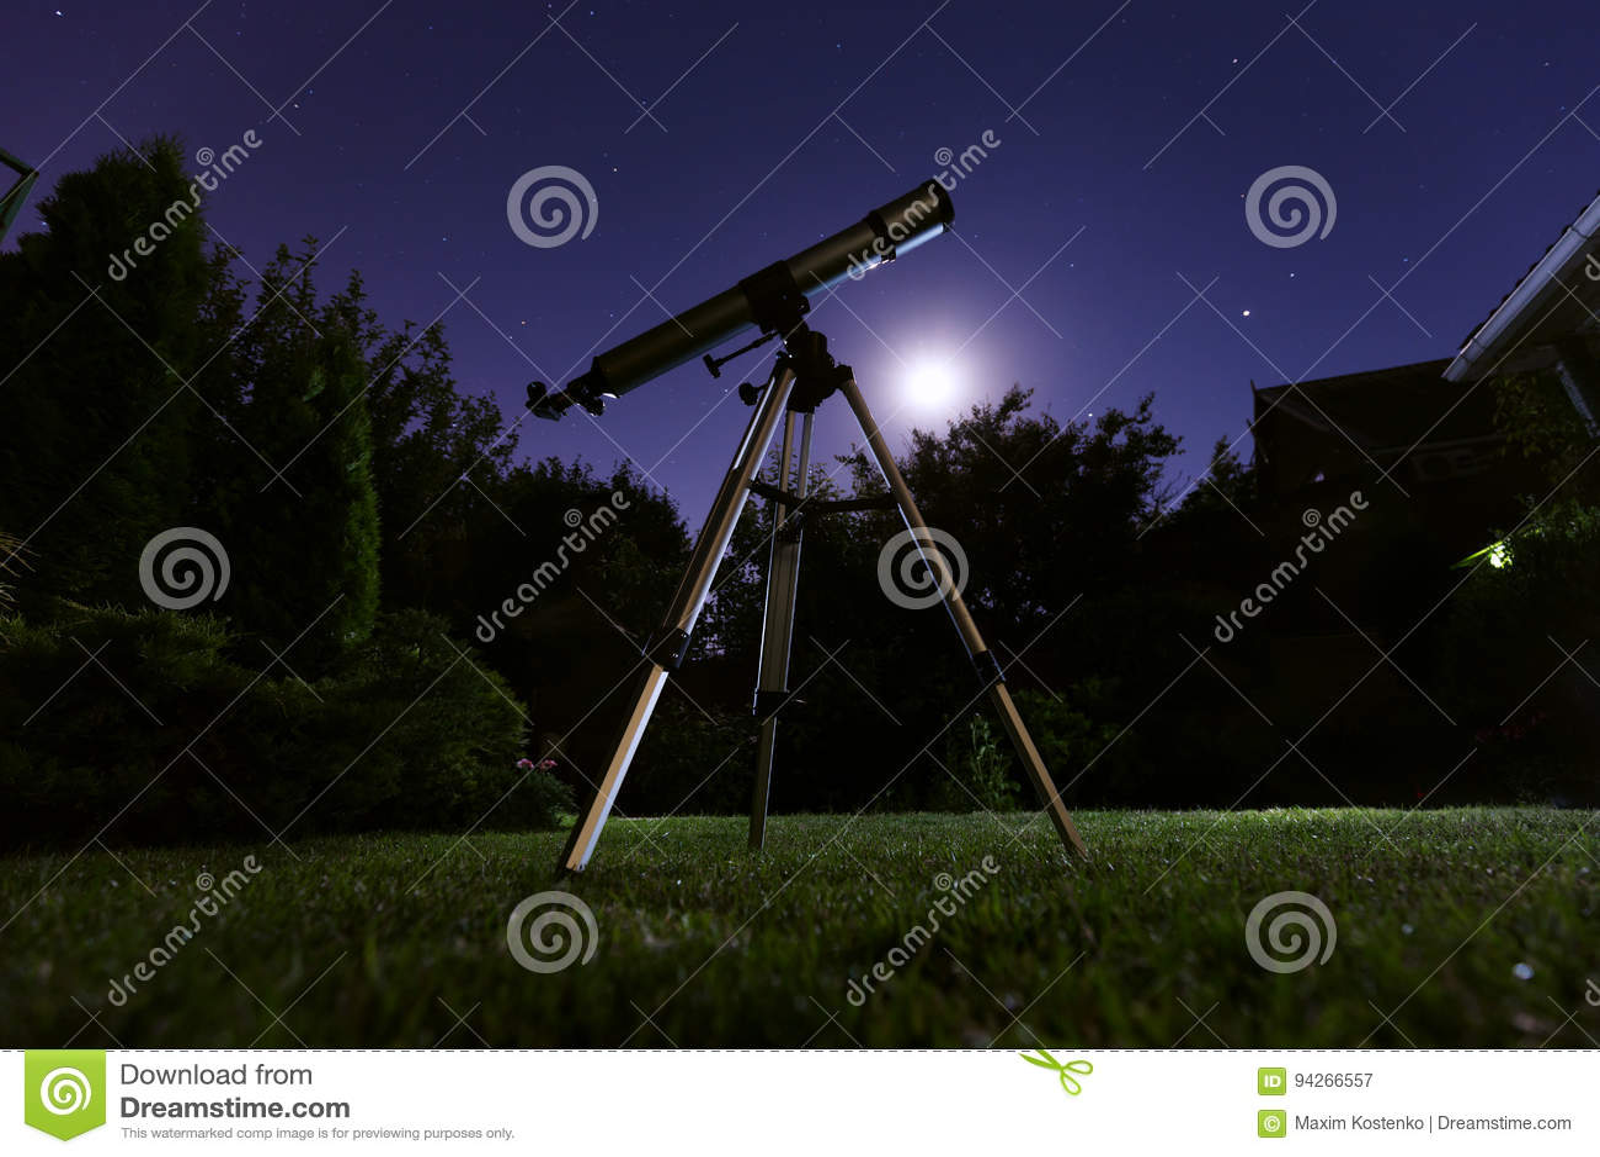 Meade  schmidt newton spiegelteleskop teleskop astronomie